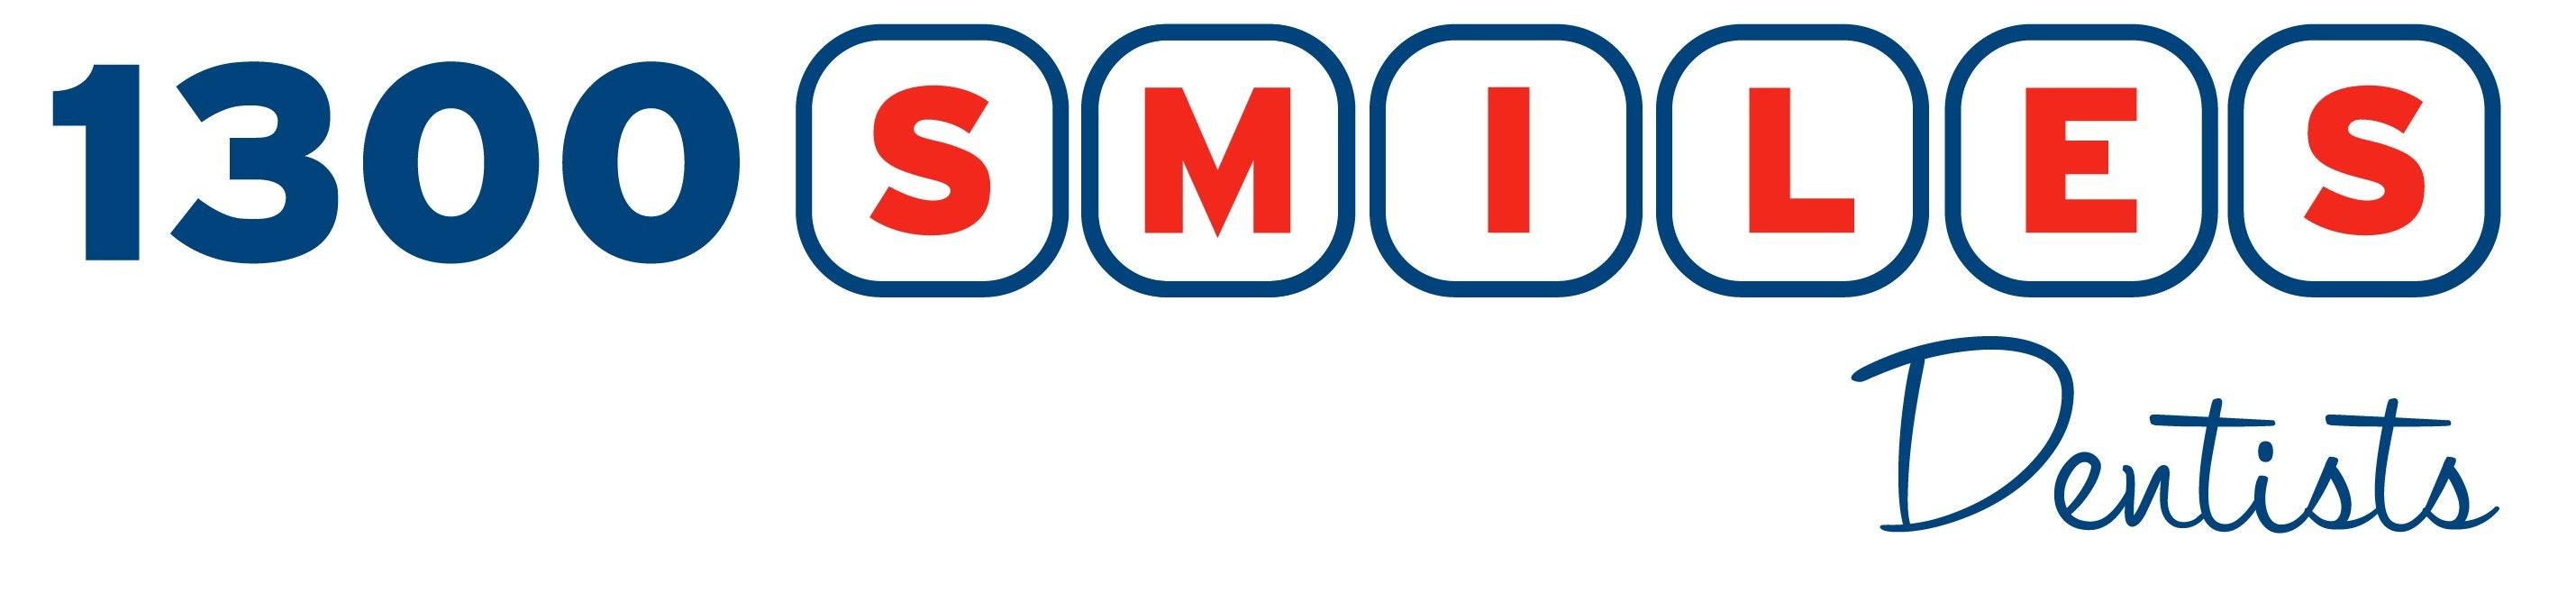 logo for 1300 Smiles - Gladstone Dentists